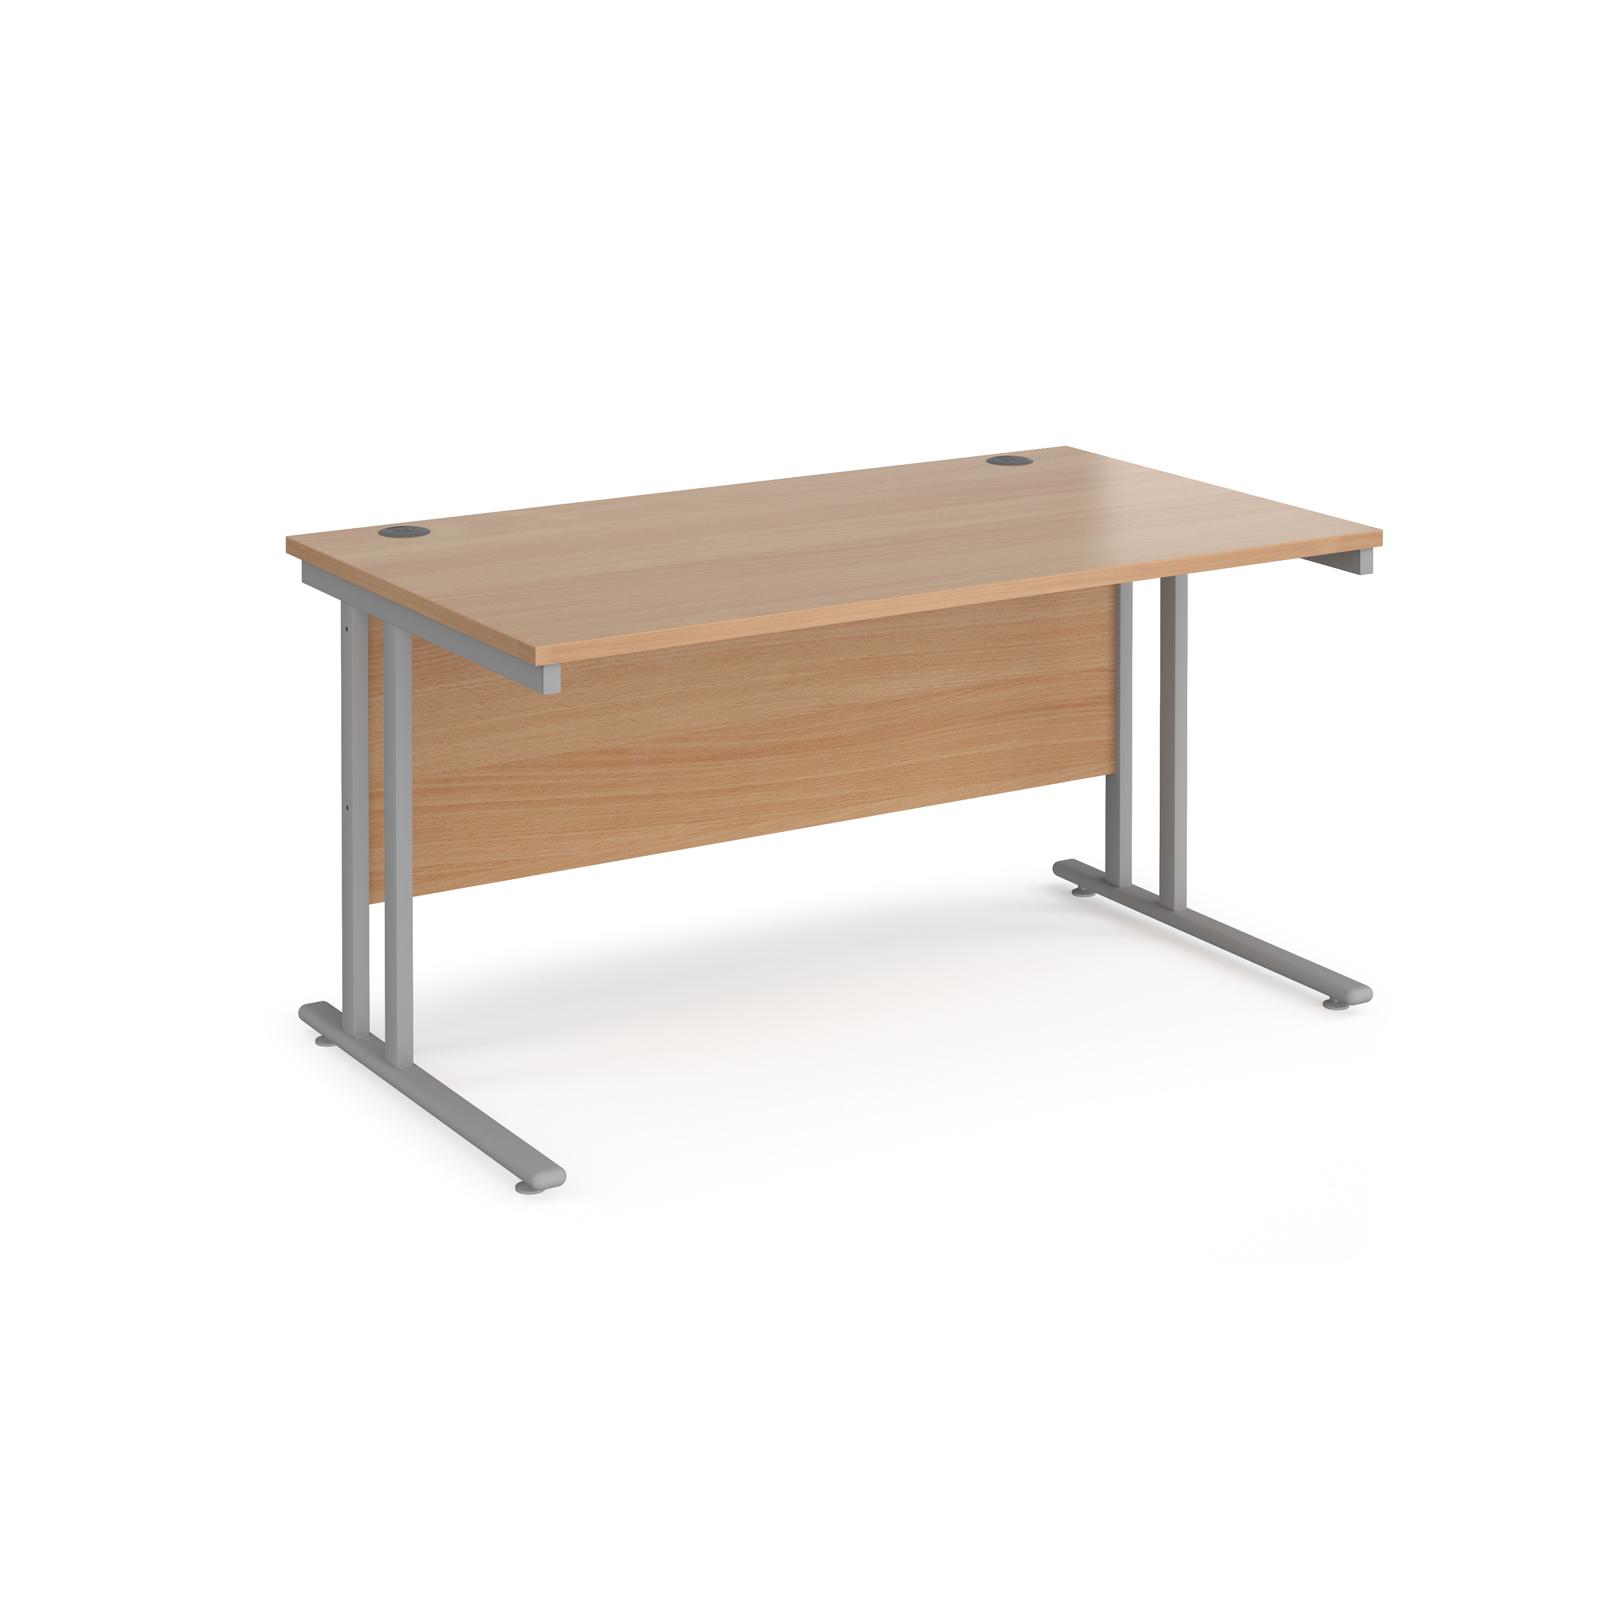 Maestro 25 SL straight desk 1400mm x 800mm - silver cantilever frame, beech top